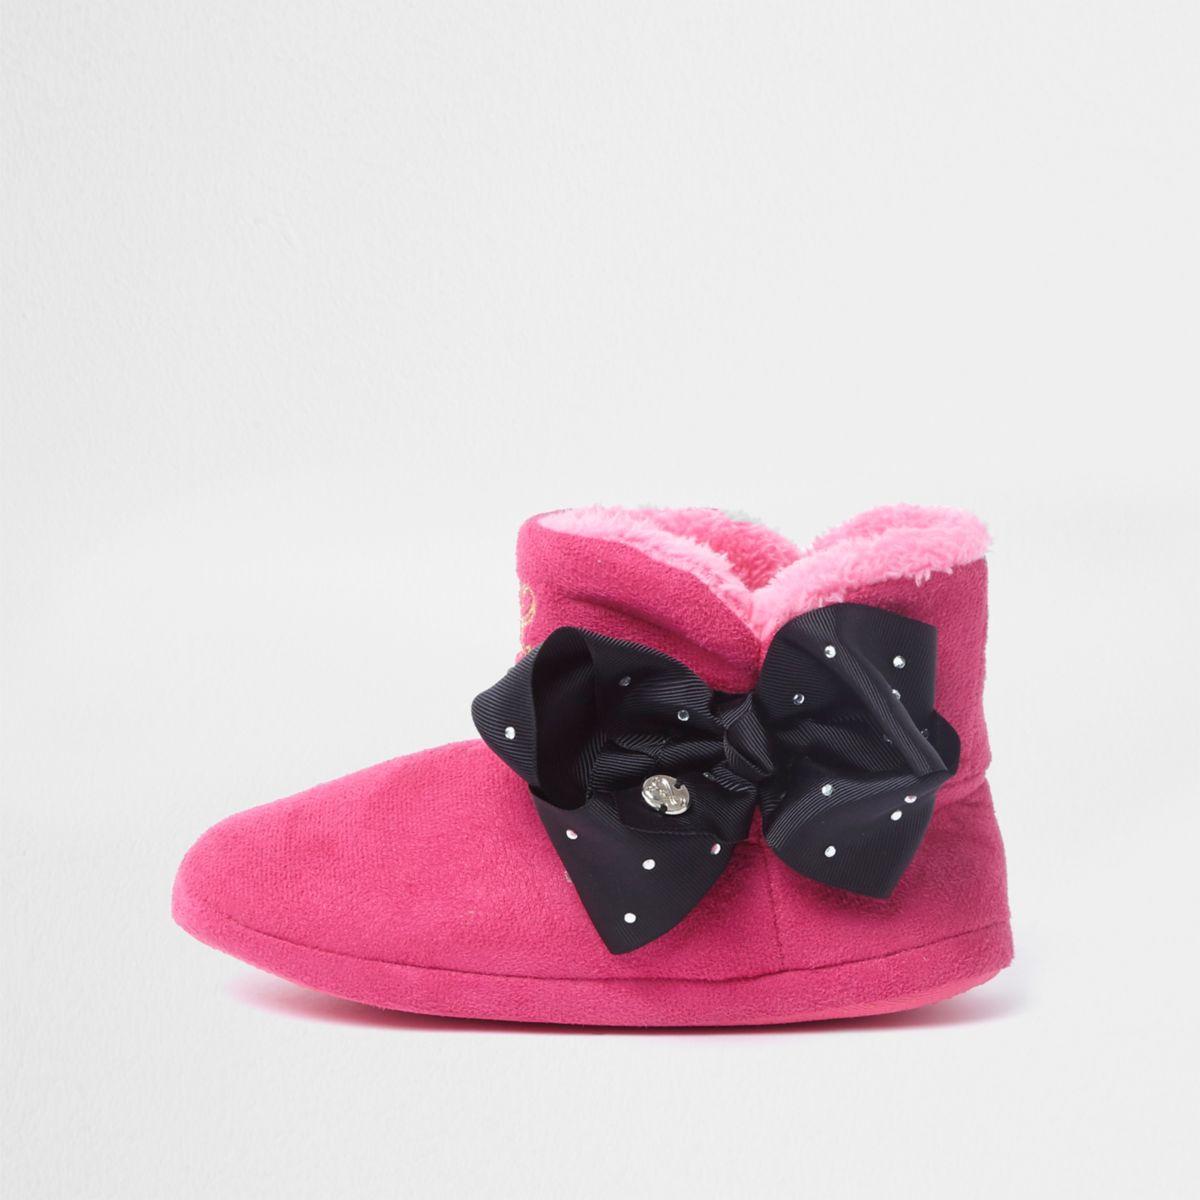 JoJo Bows – Chaussons bottes roses pour fille